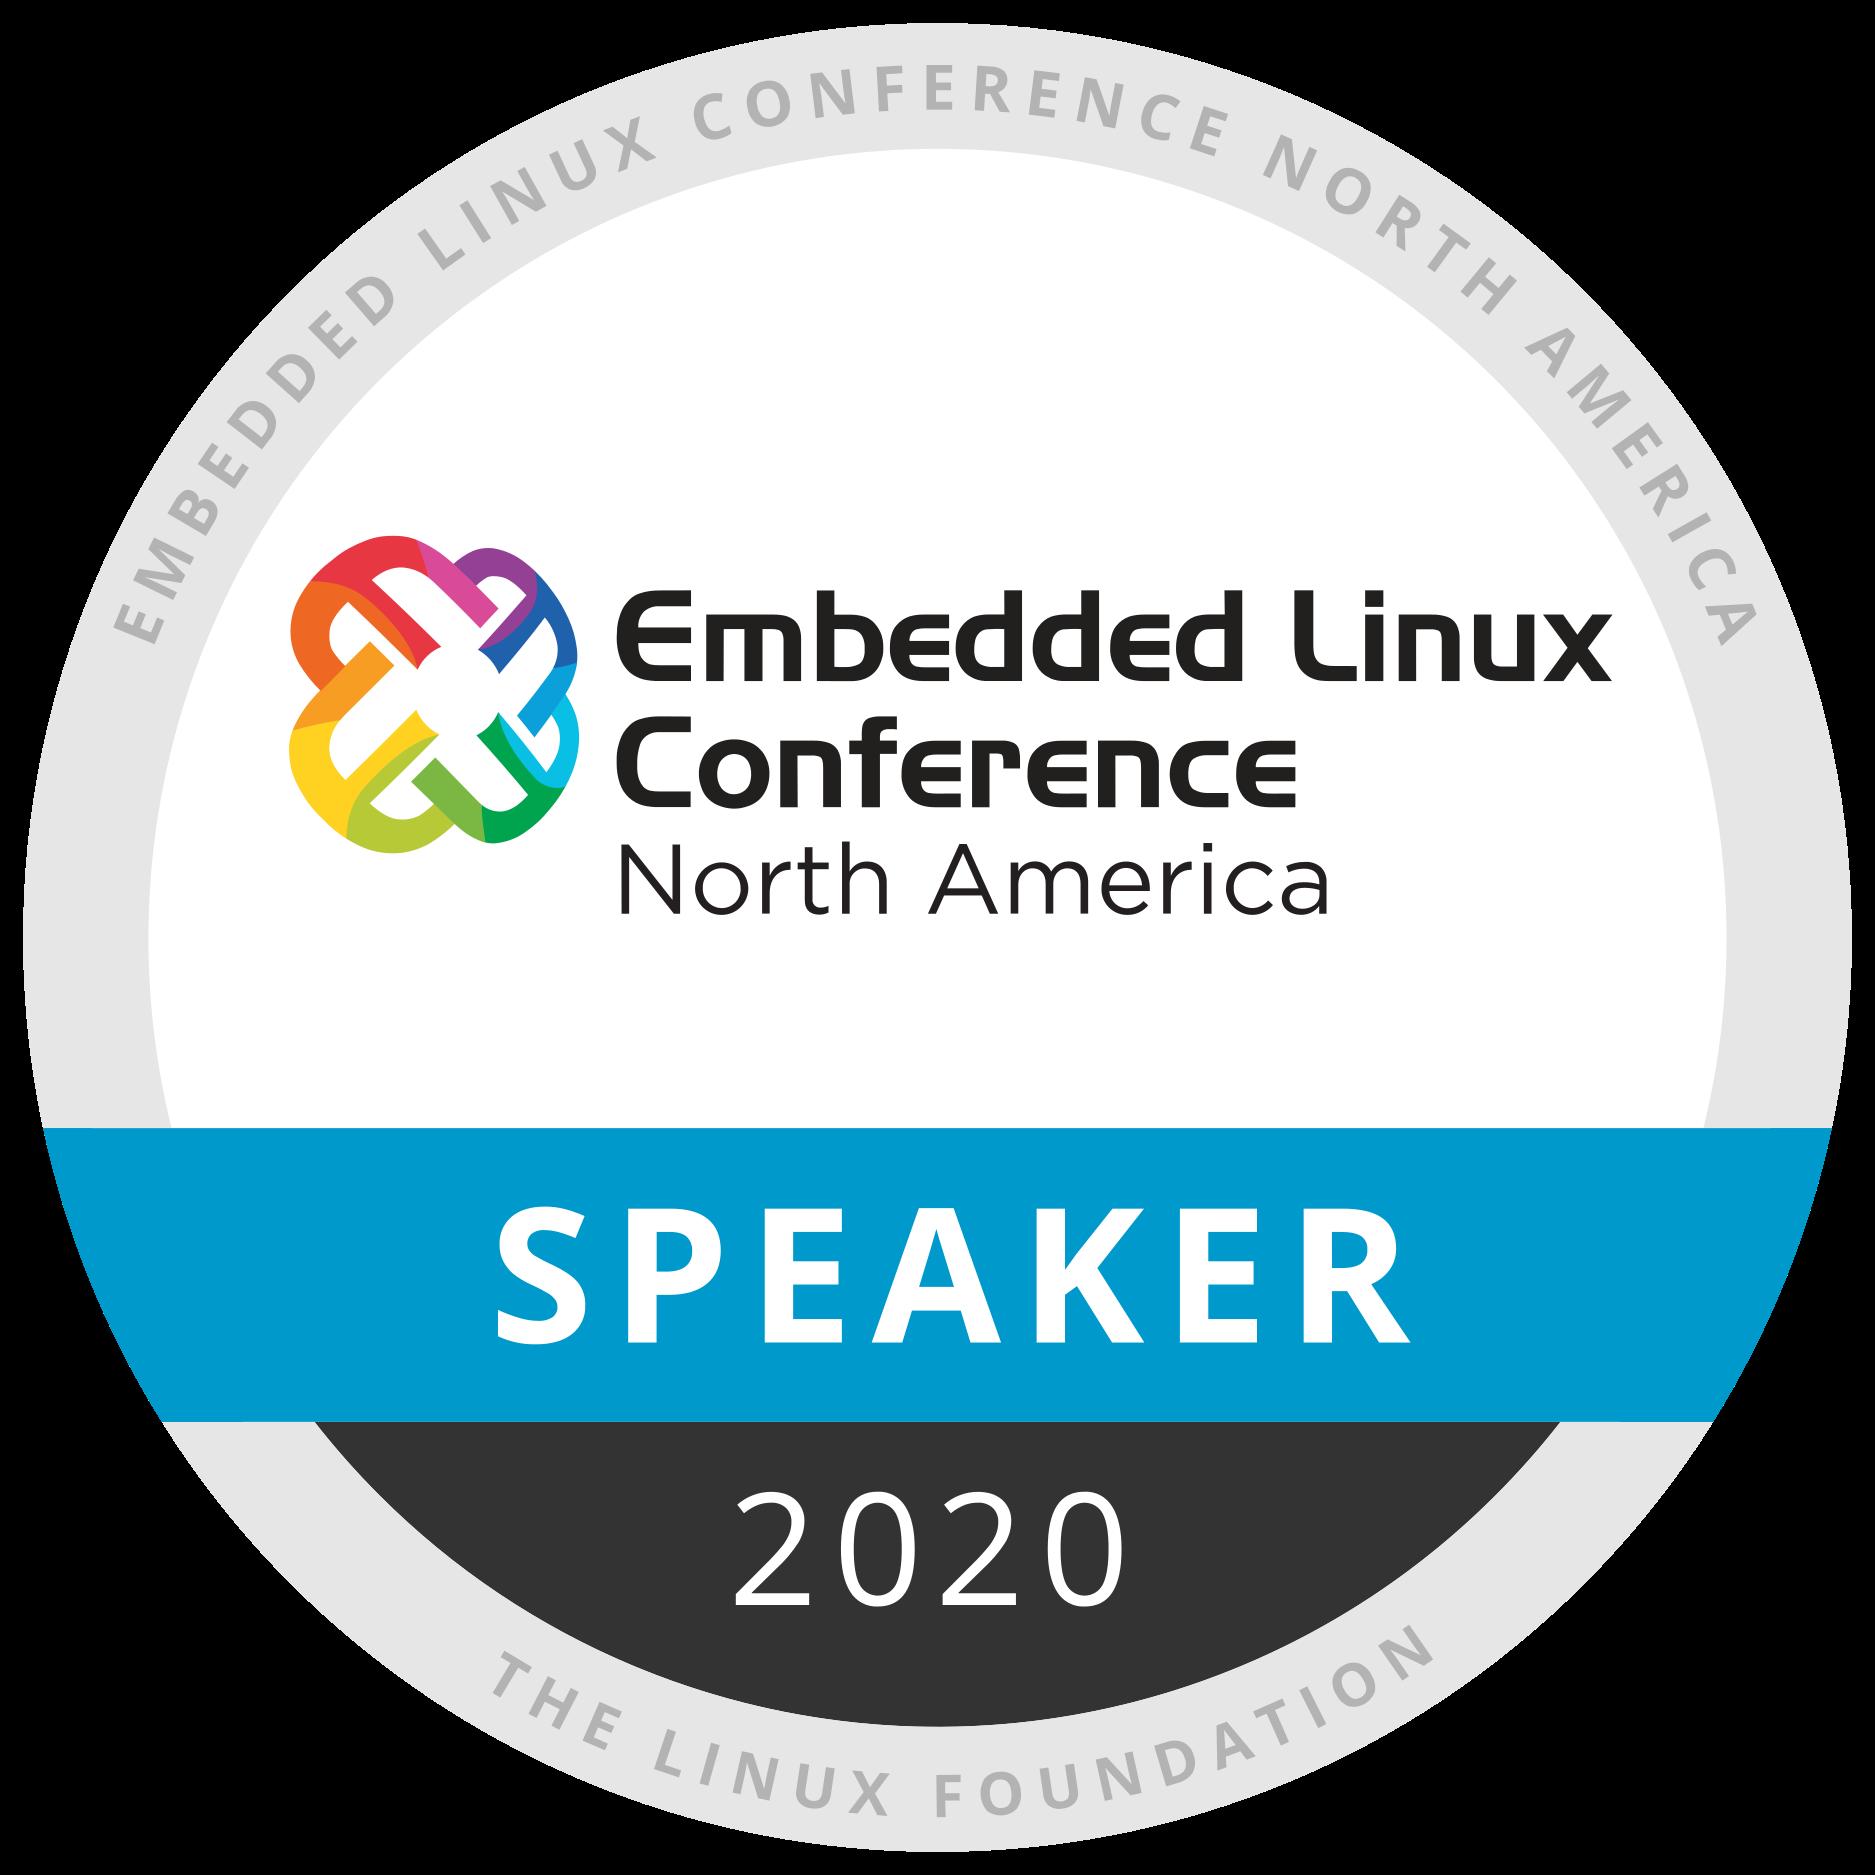 Speaker: Embedded Linux Conference North America 2020